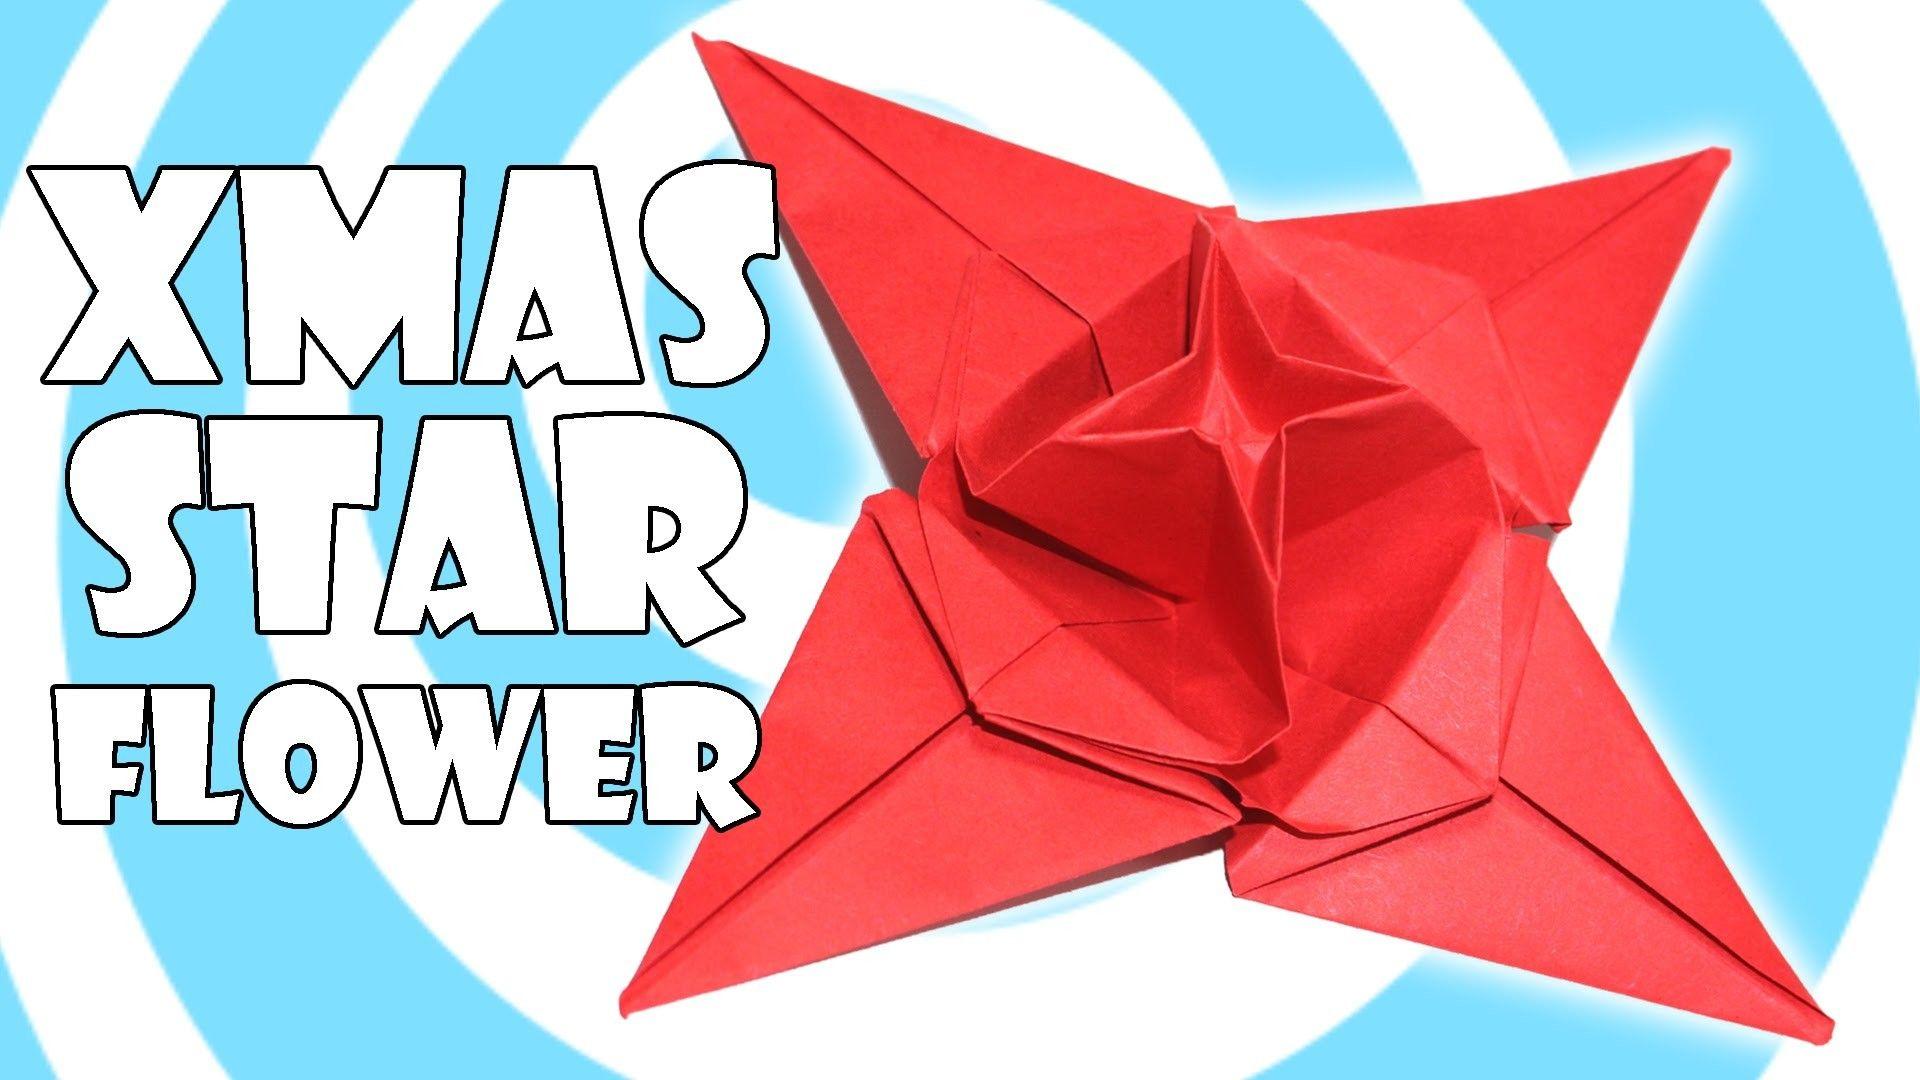 Diy Origami Christmas Star Flower Tutorial Origamite Pinterest